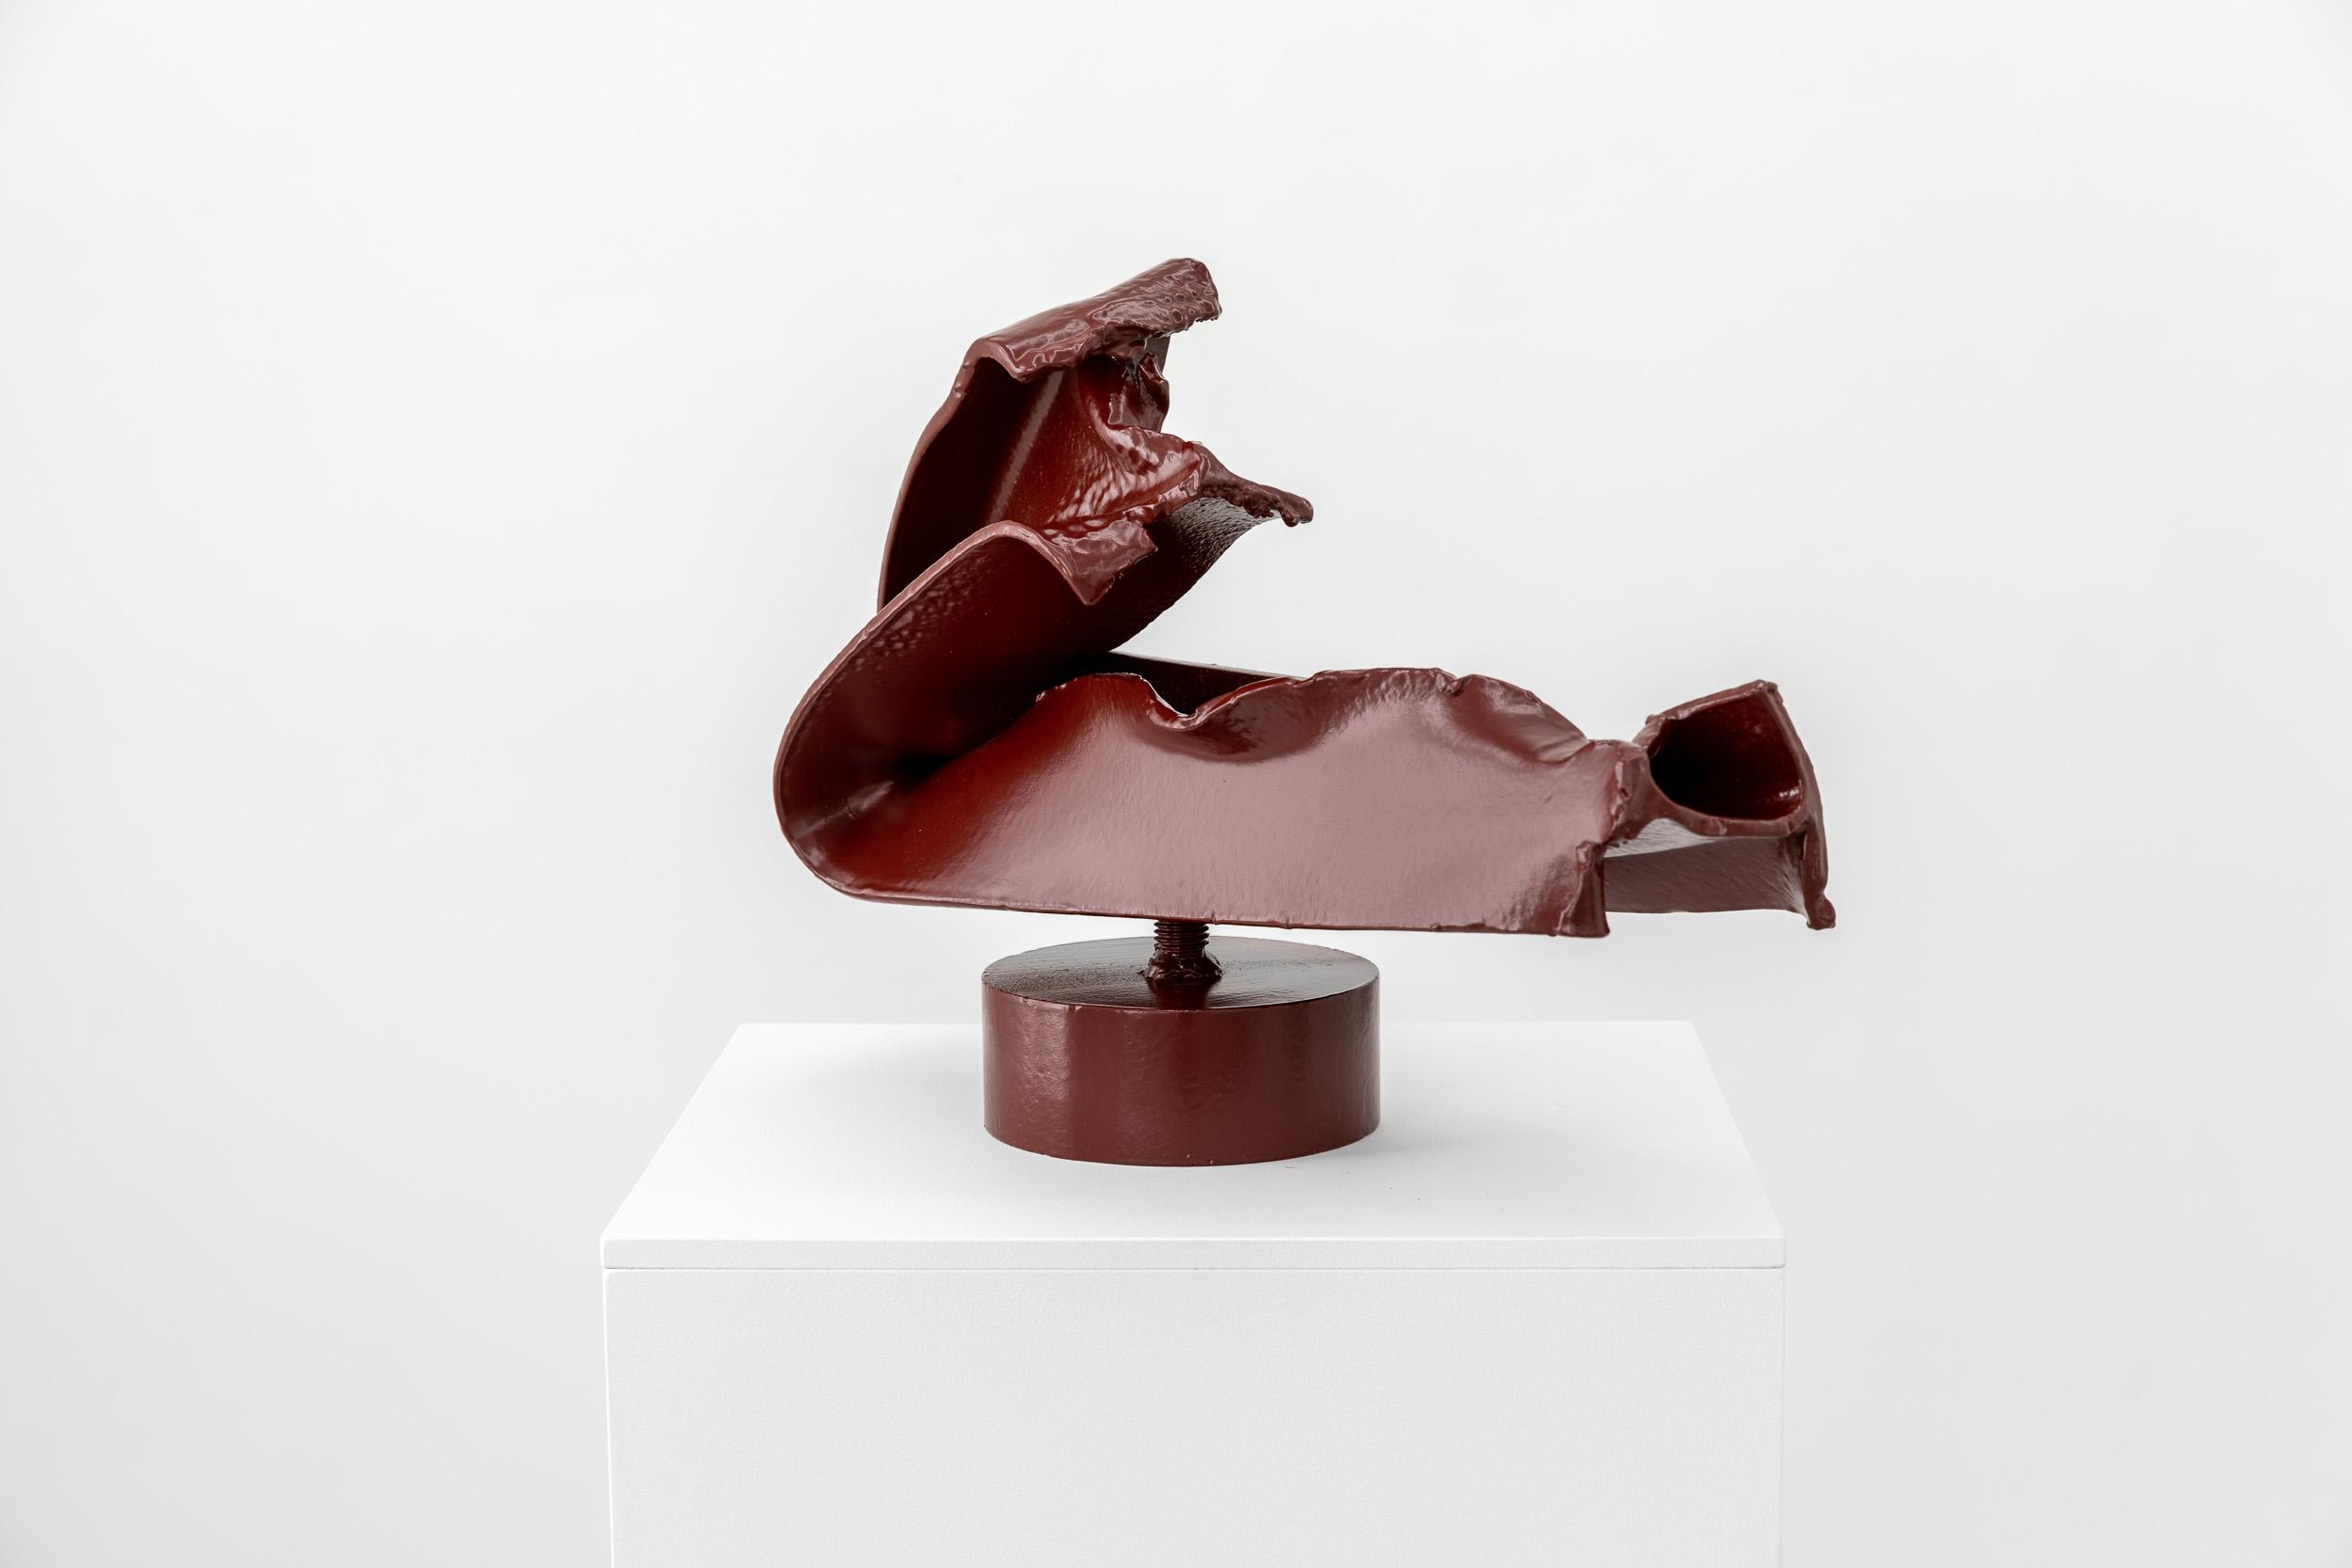 Rodin's Elbow, 2021, Painted steel, 36 x 50 x 19 cm